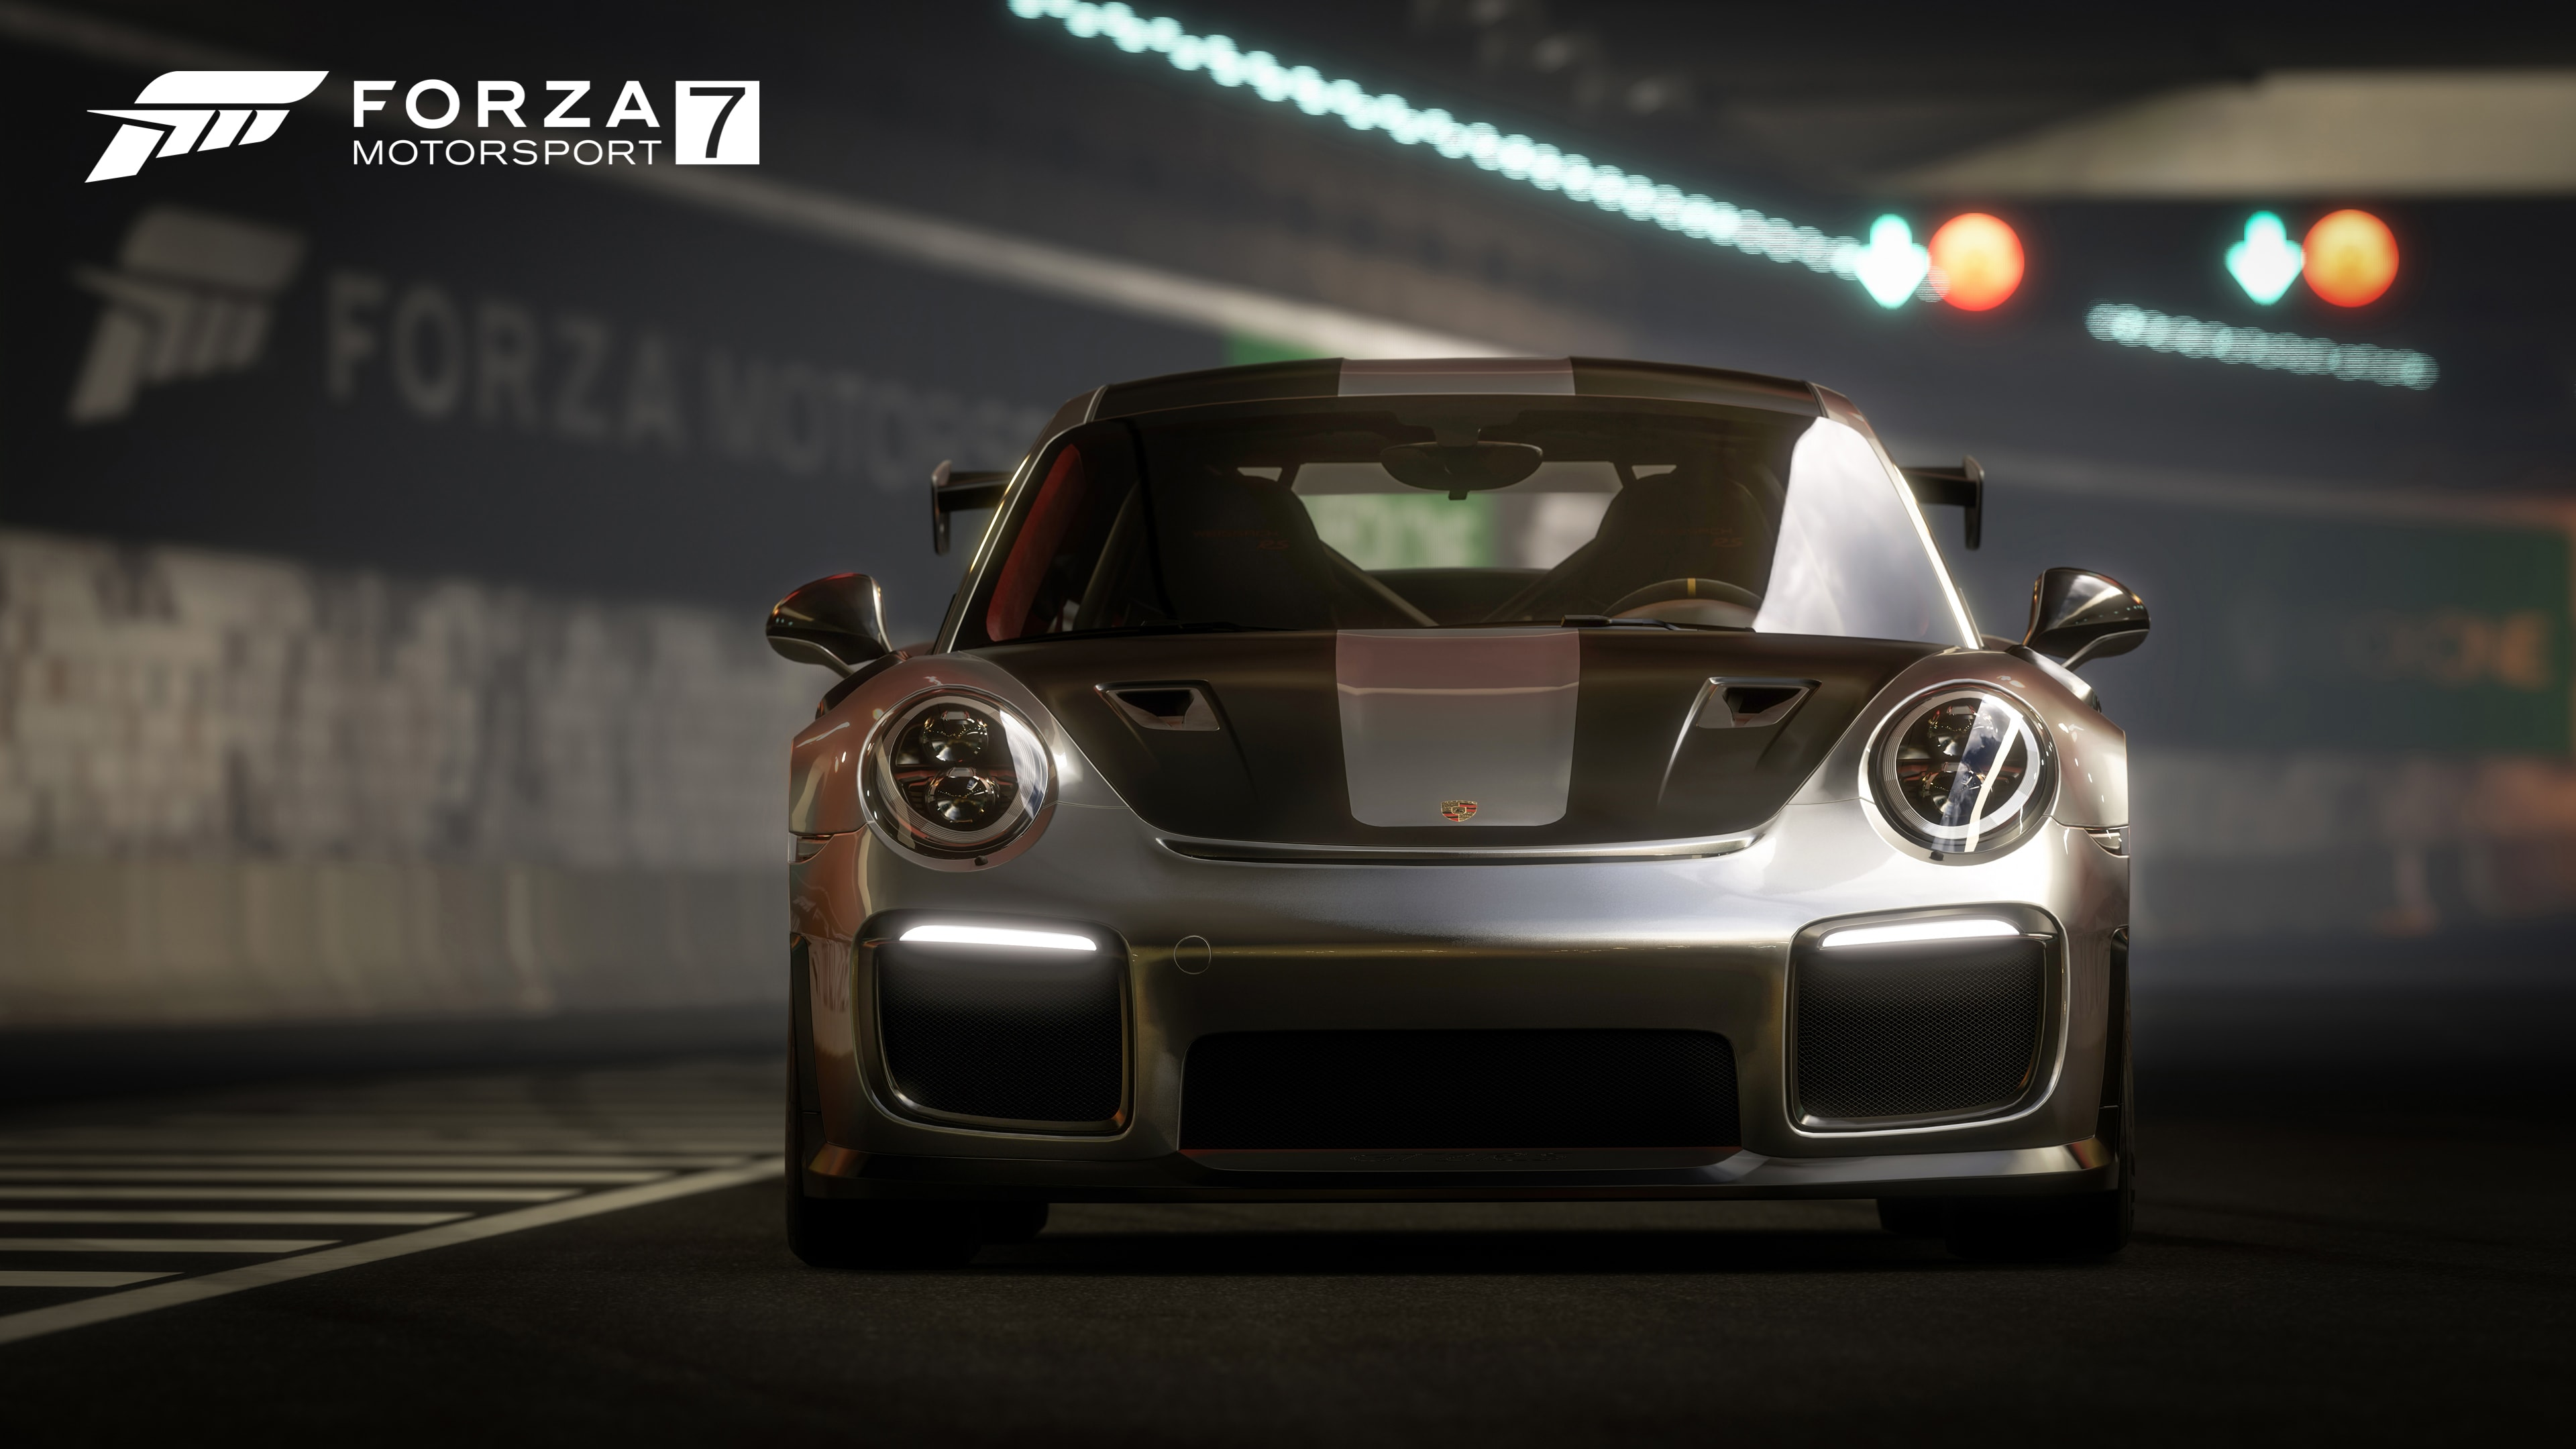 Forza Motorsport 7 Porsche 4k 2905 Wallpapers and Stock 3840x2160